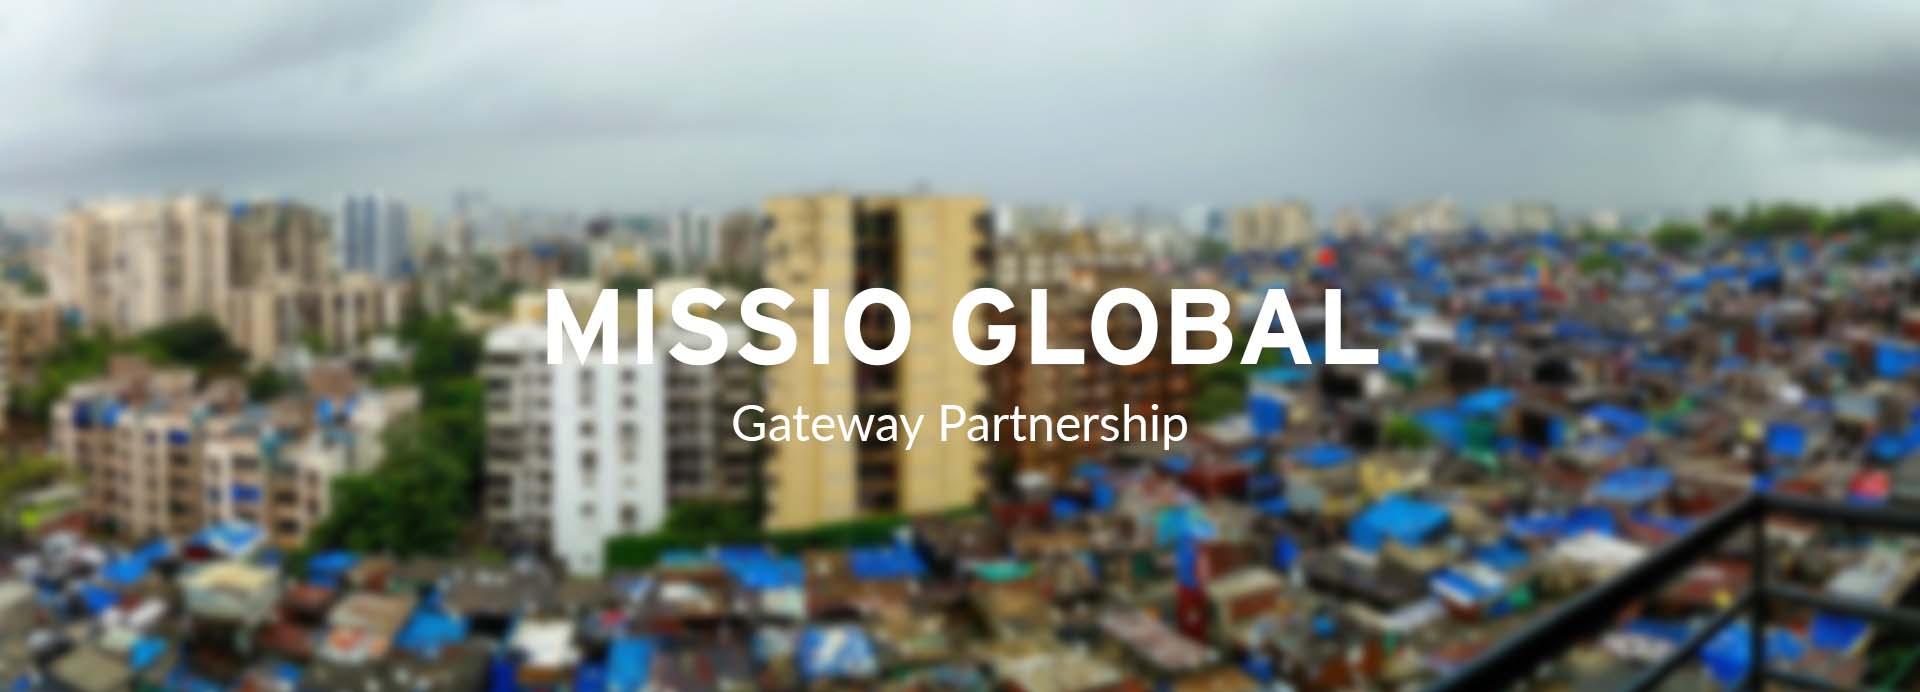 Gateway Partnership Banner.jpg